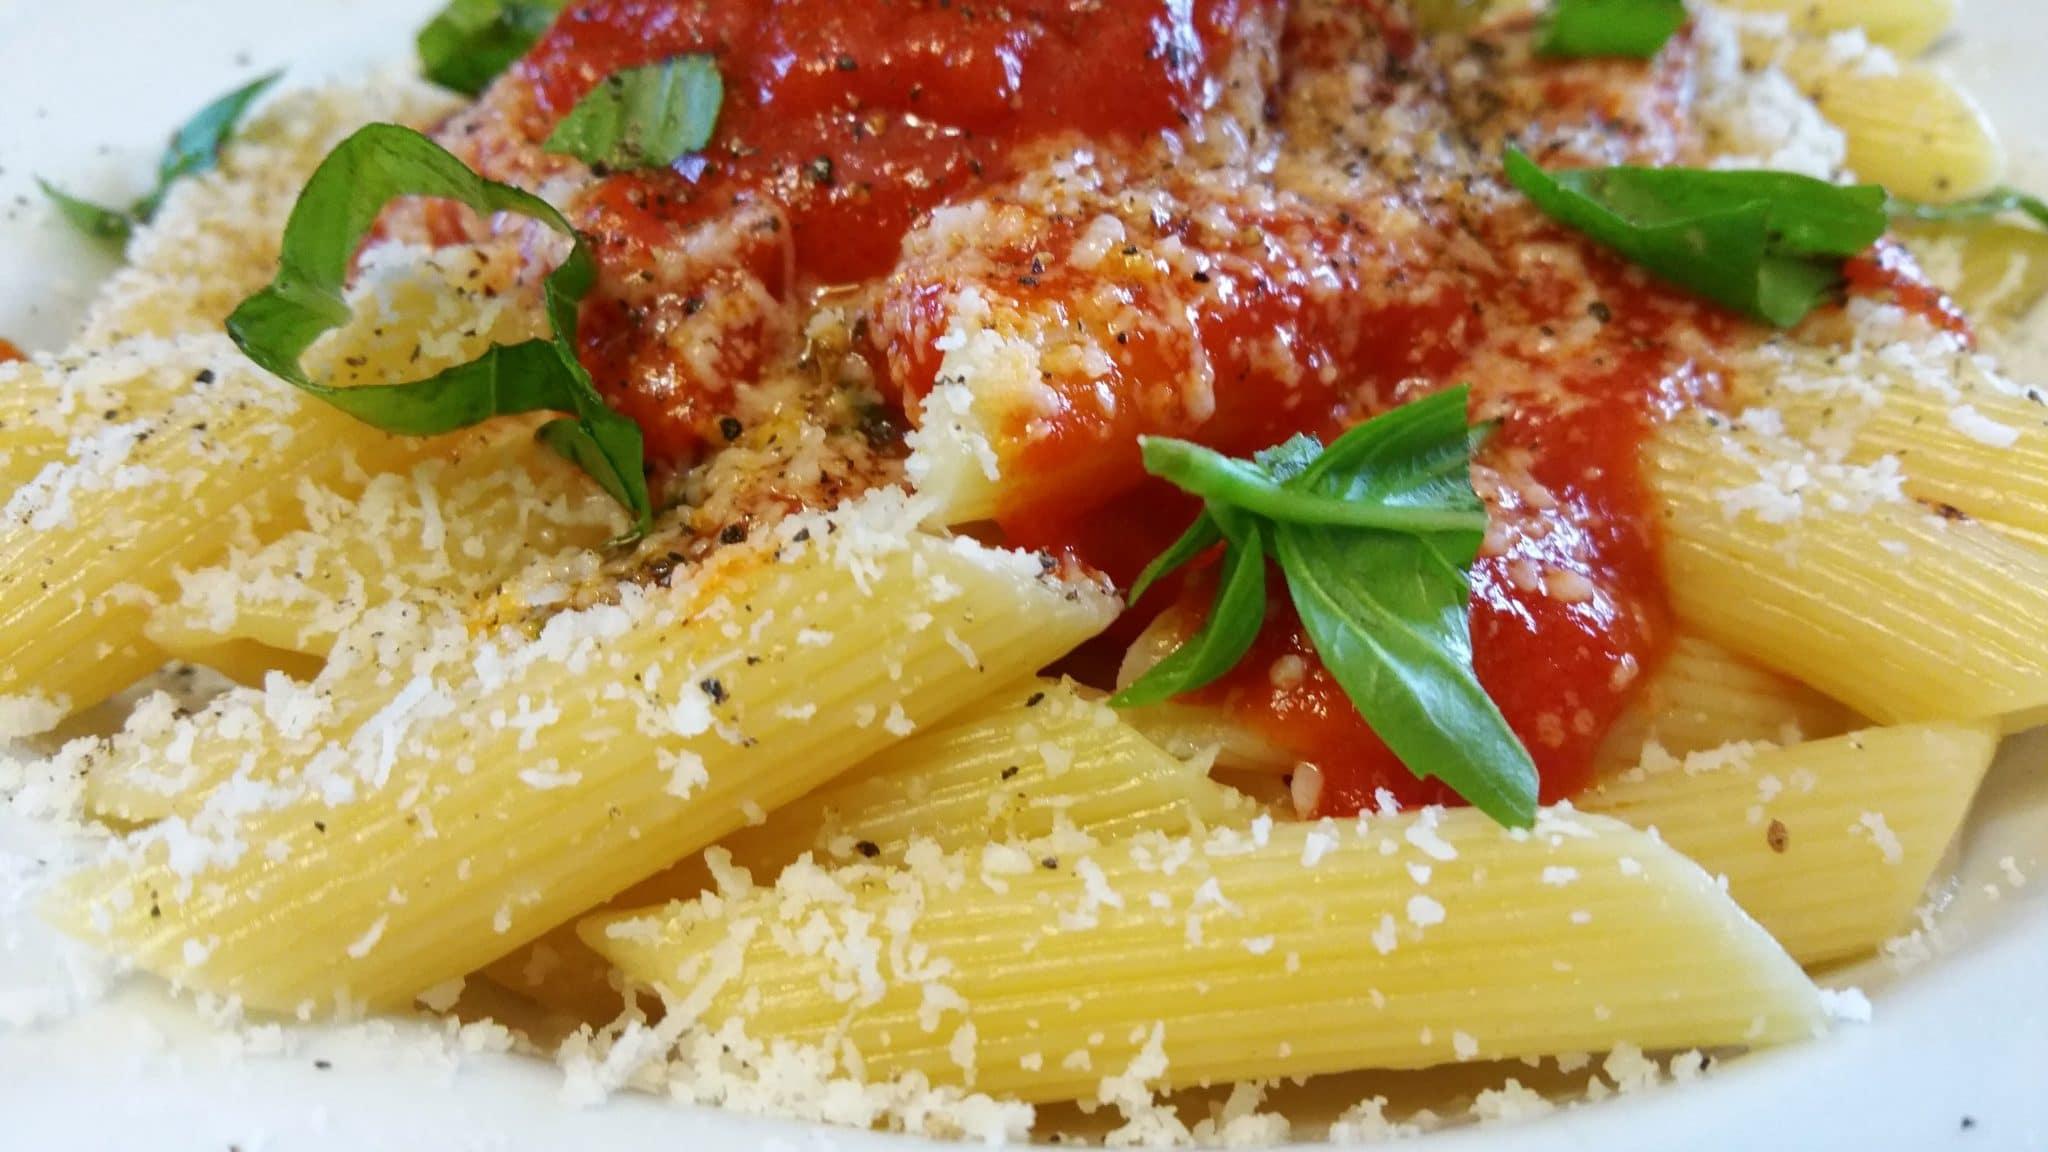 macaroni noodles, macaroni pasta